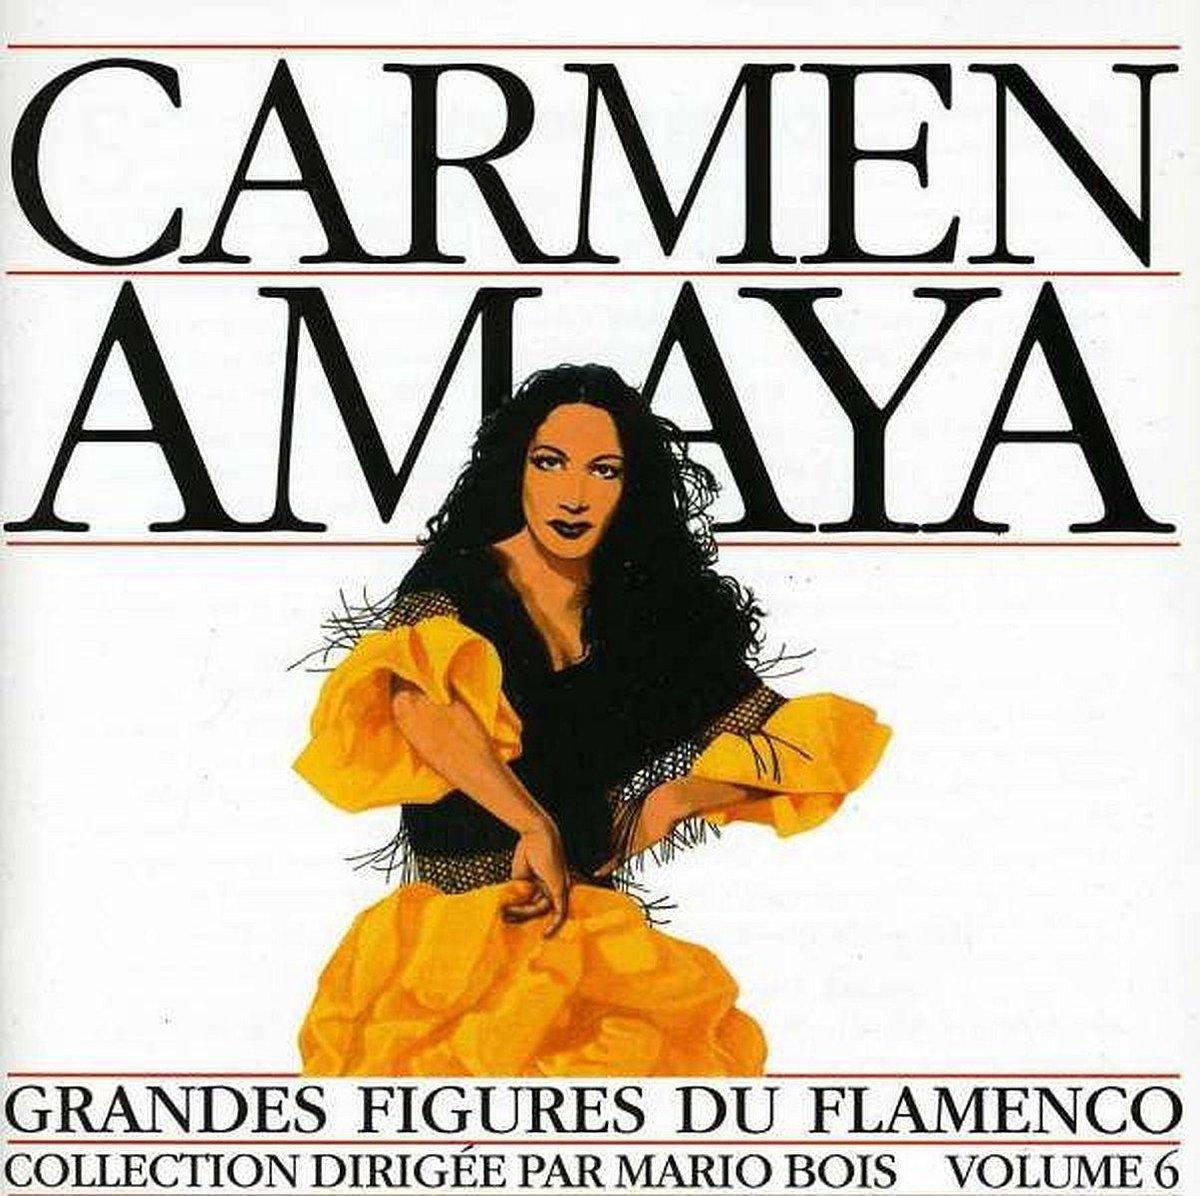 Grandes Figures Du Flamenco: Vol. 6 - Carmen Amaya